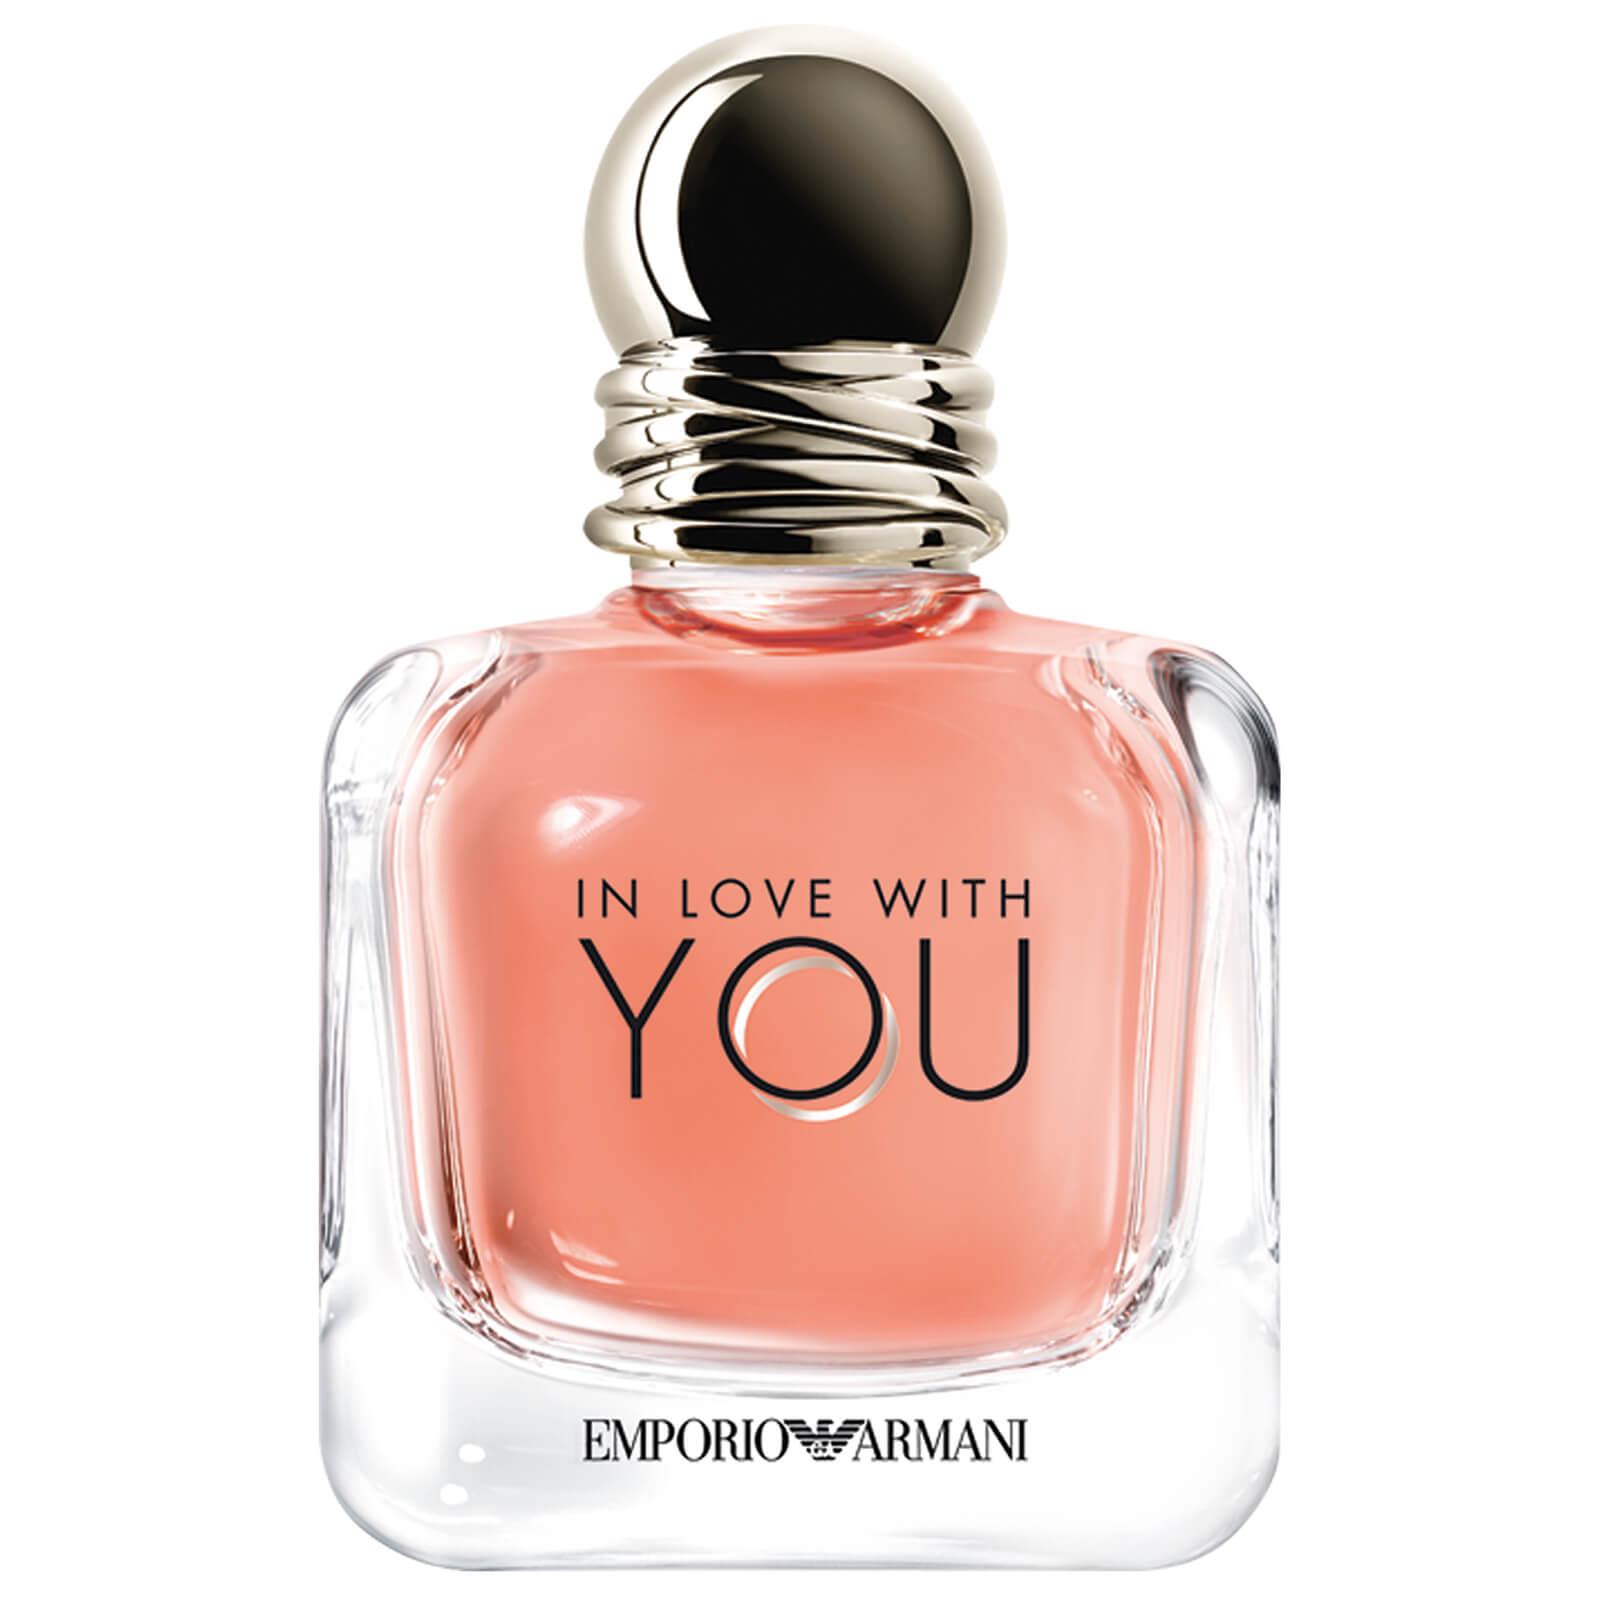 Emporio Armani In Love With You Eau De Parfum Various Sizes Free